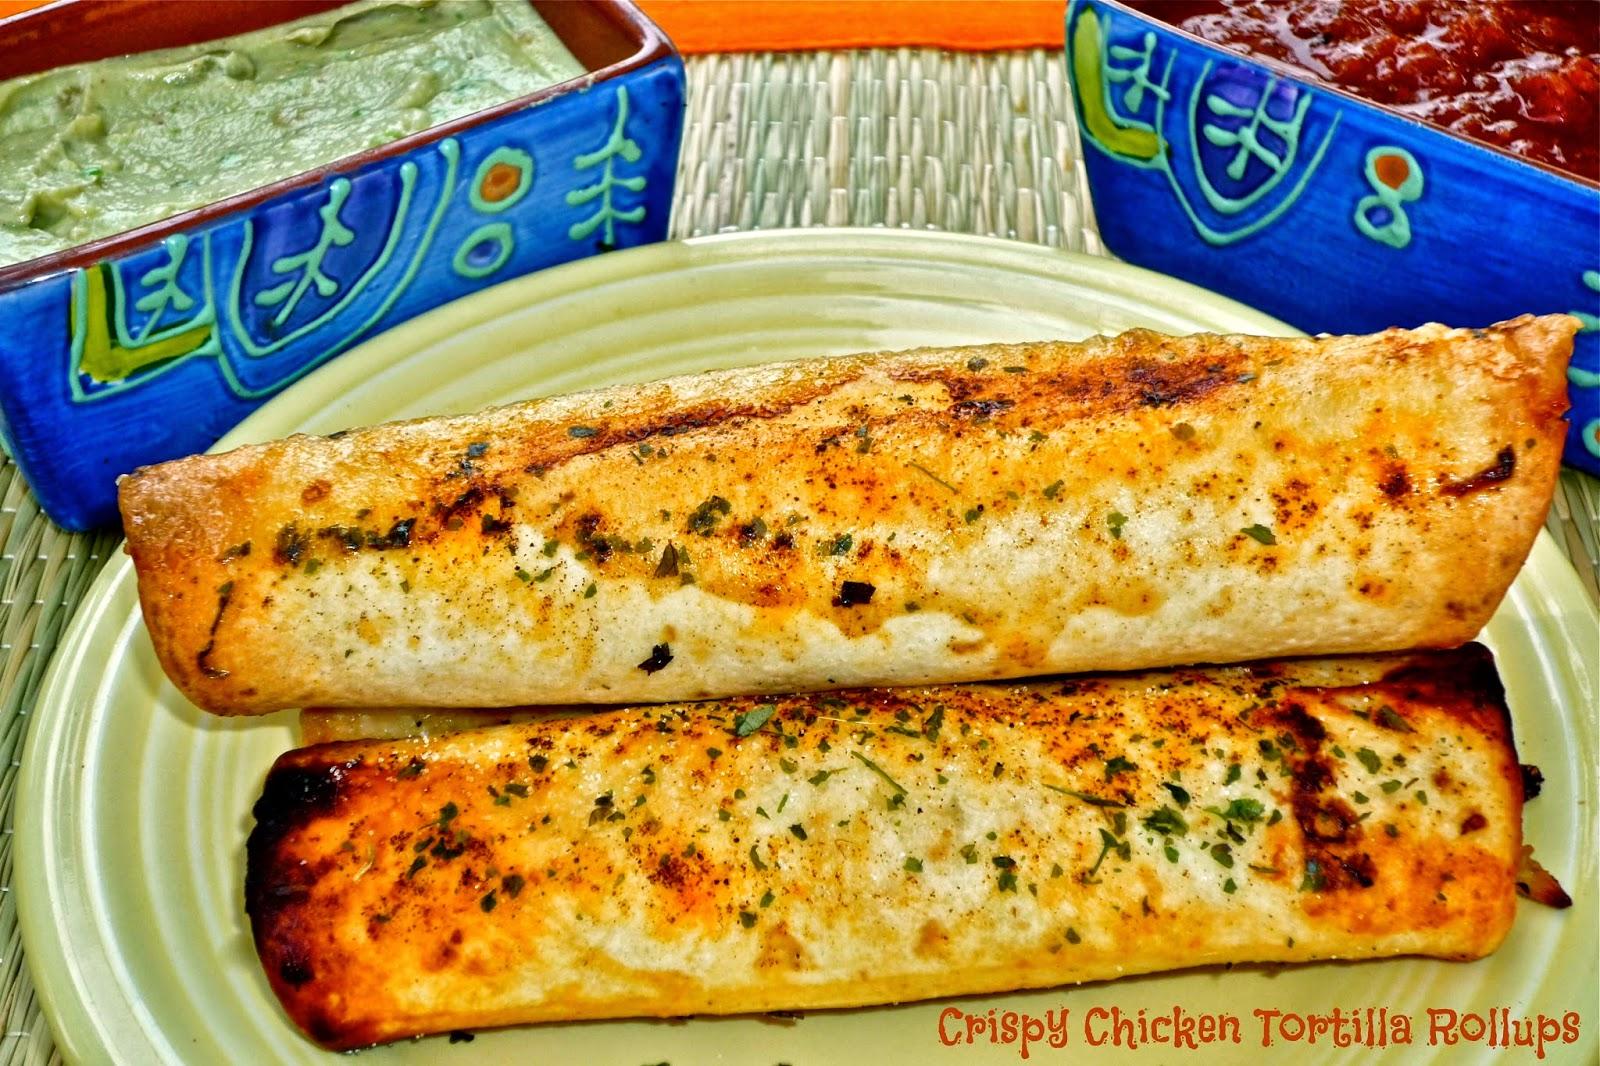 ... Weekend Gourmet: Crispy Chicken Tortilla Rollups for #WeekdaySupper